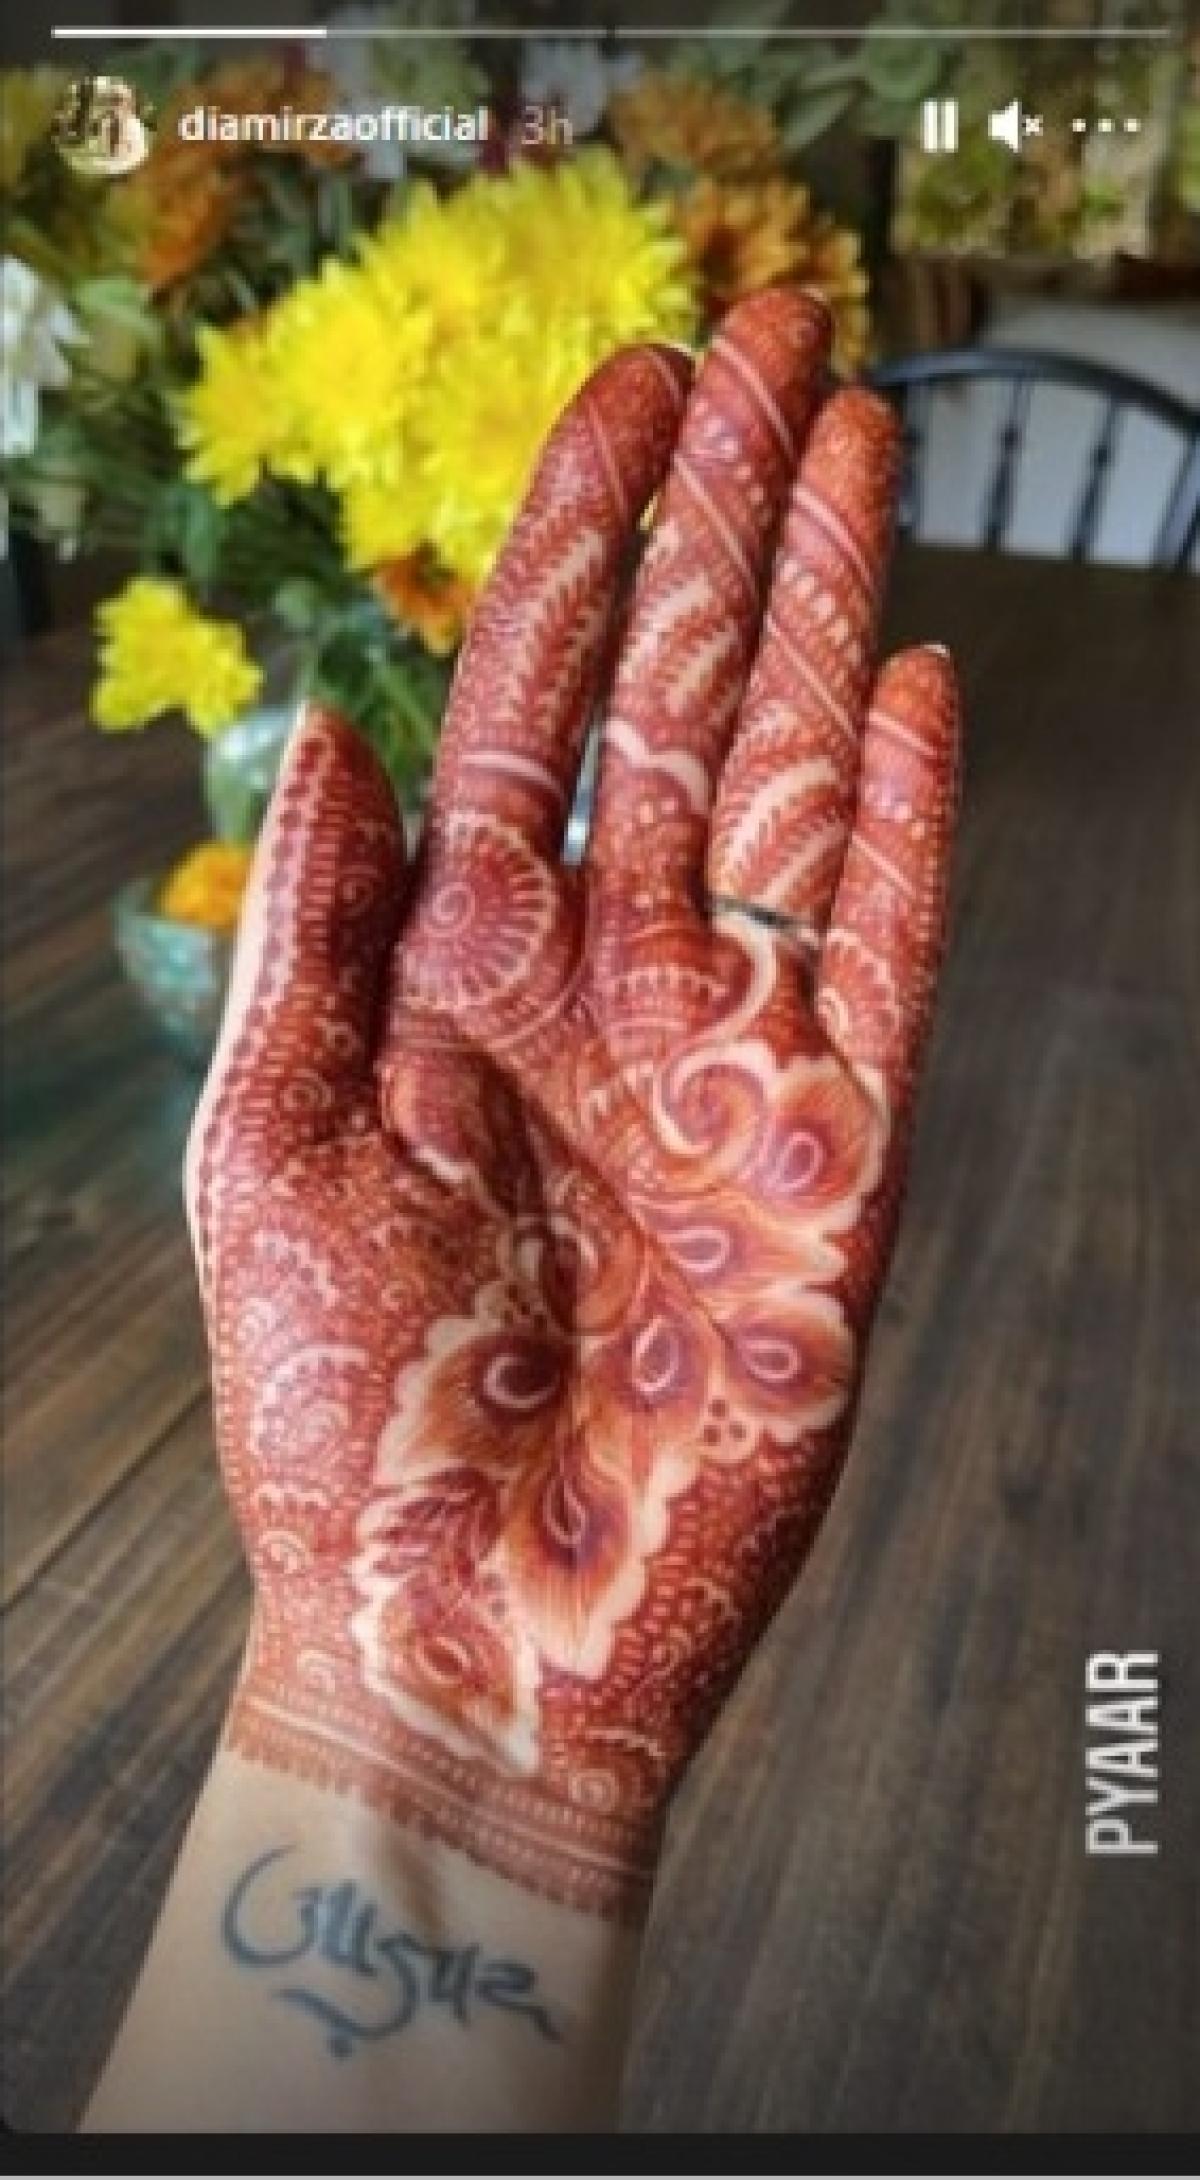 Dia Mirza flaunts her mehendi, bride-to-be sash ahead of wedding with Vaibhav Rekhi